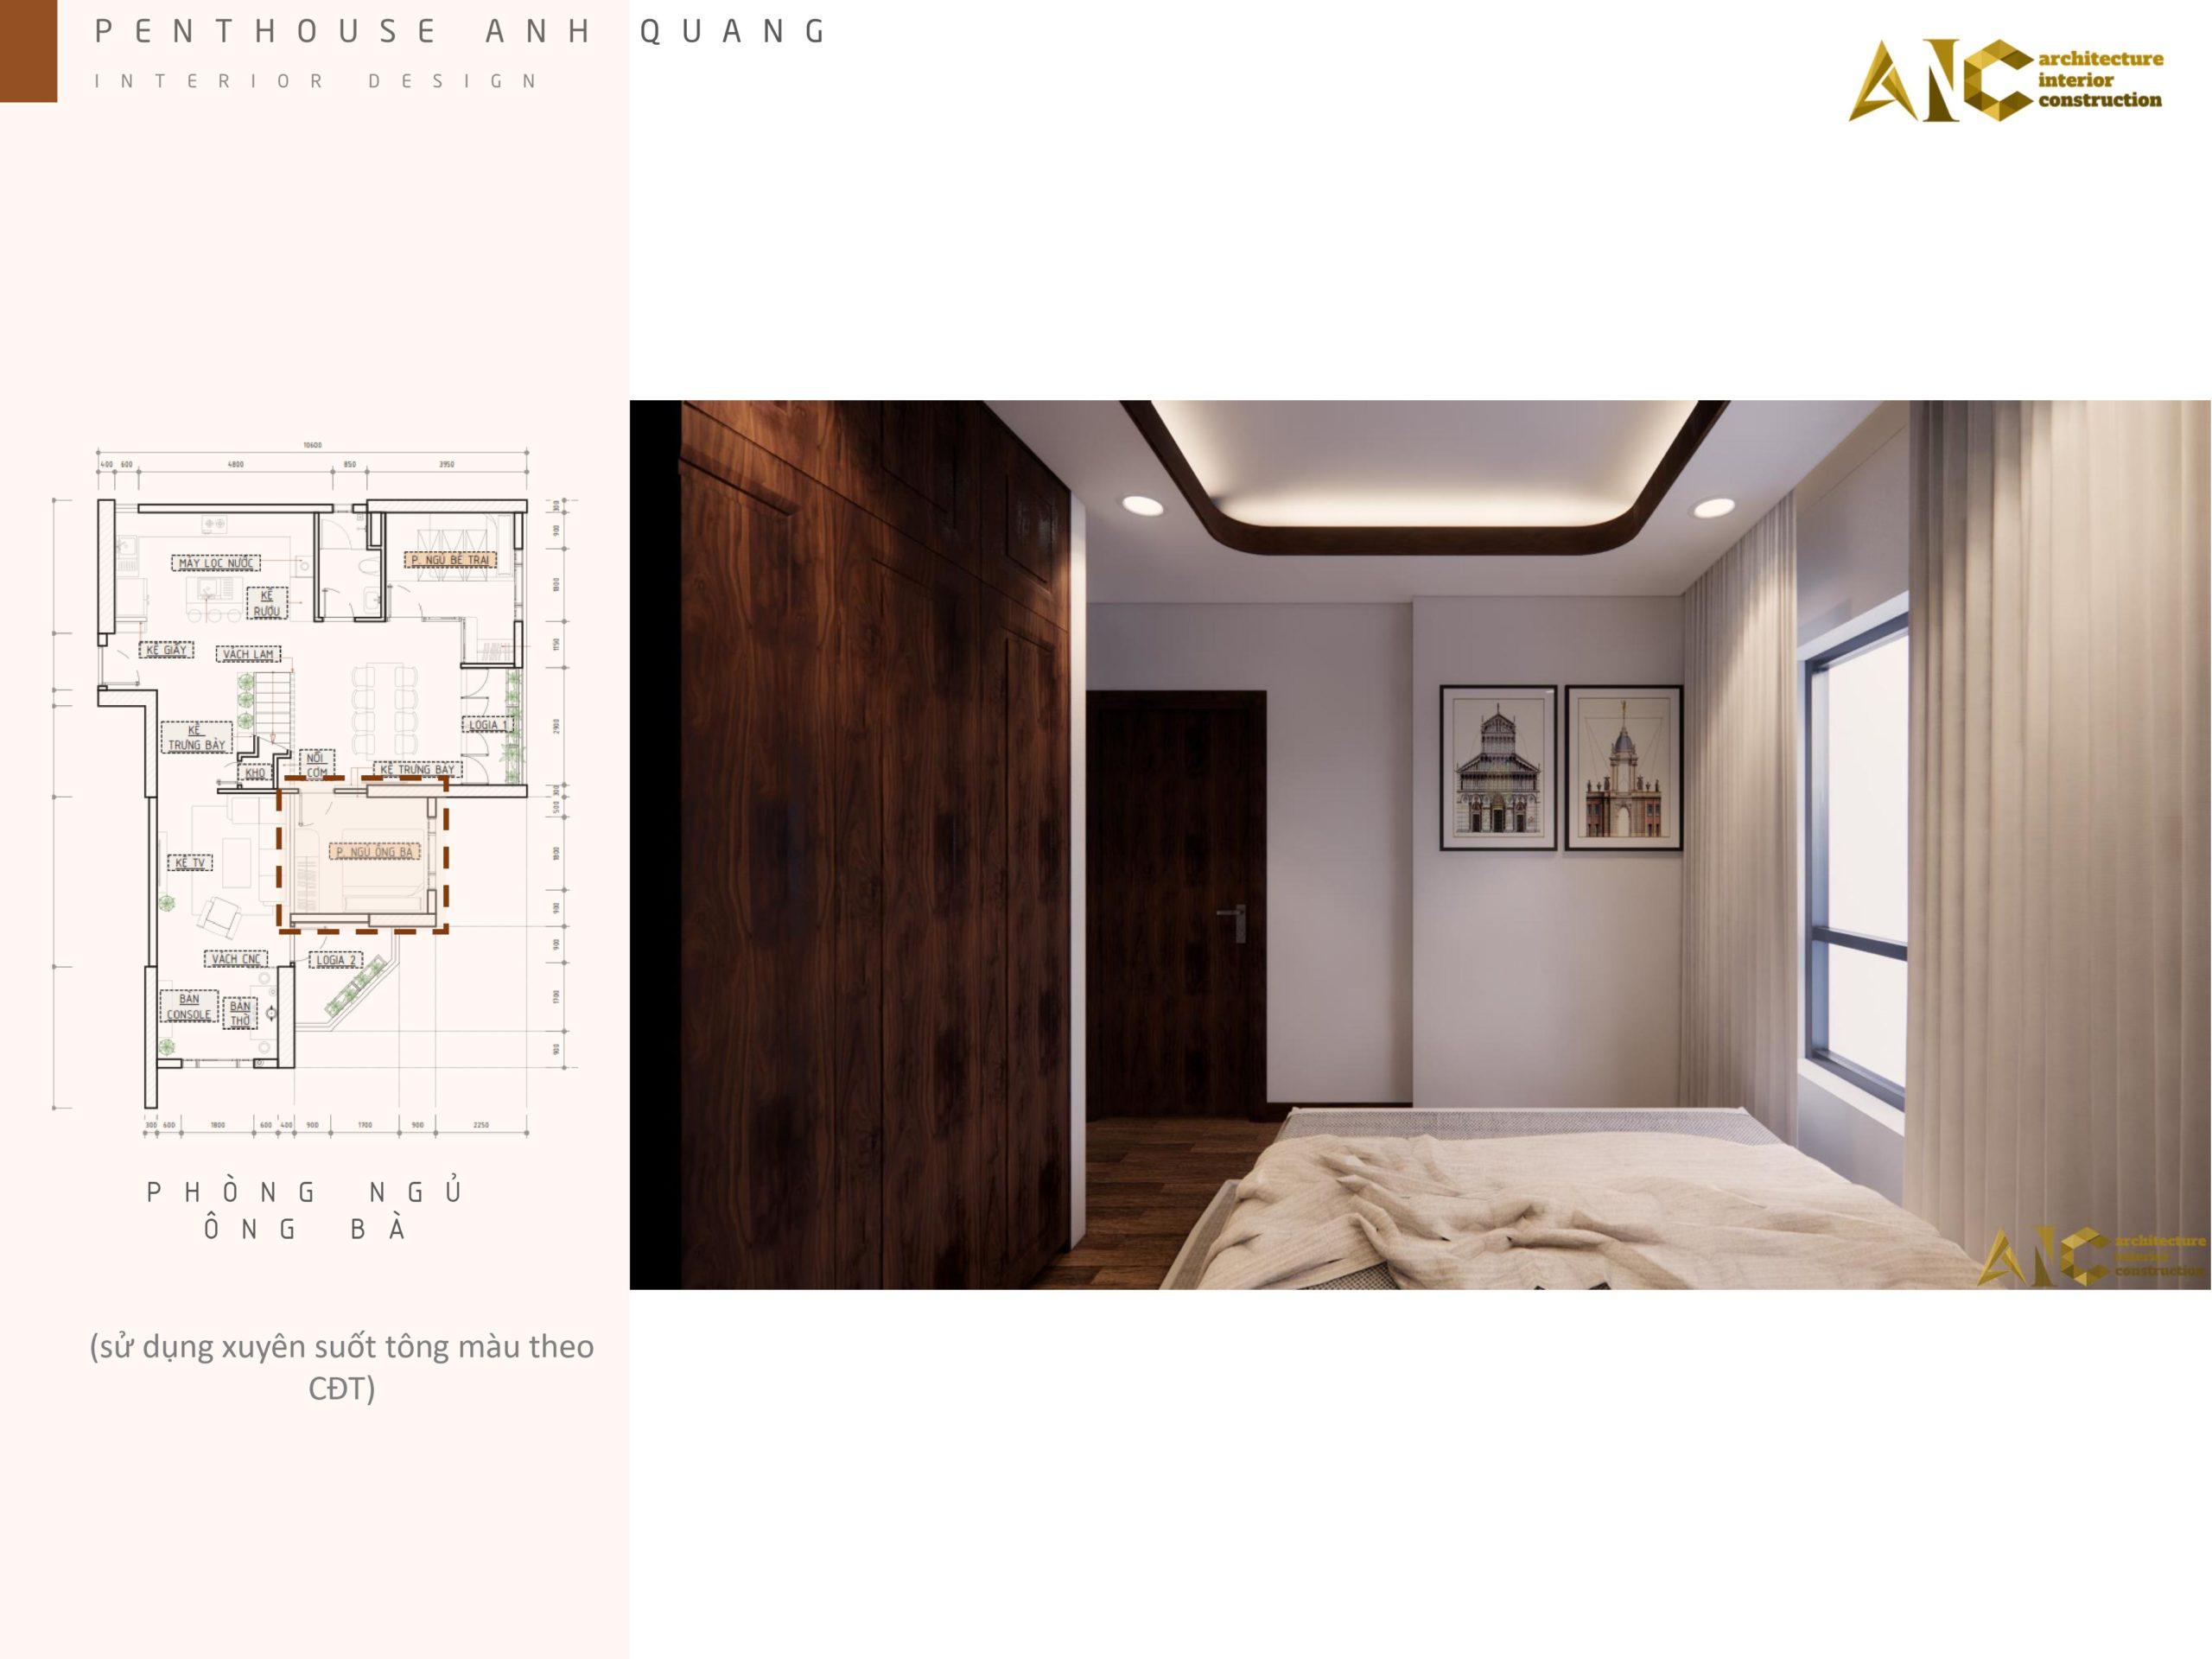 Penthouse-Anh-Quang-AIC-JSC-0064